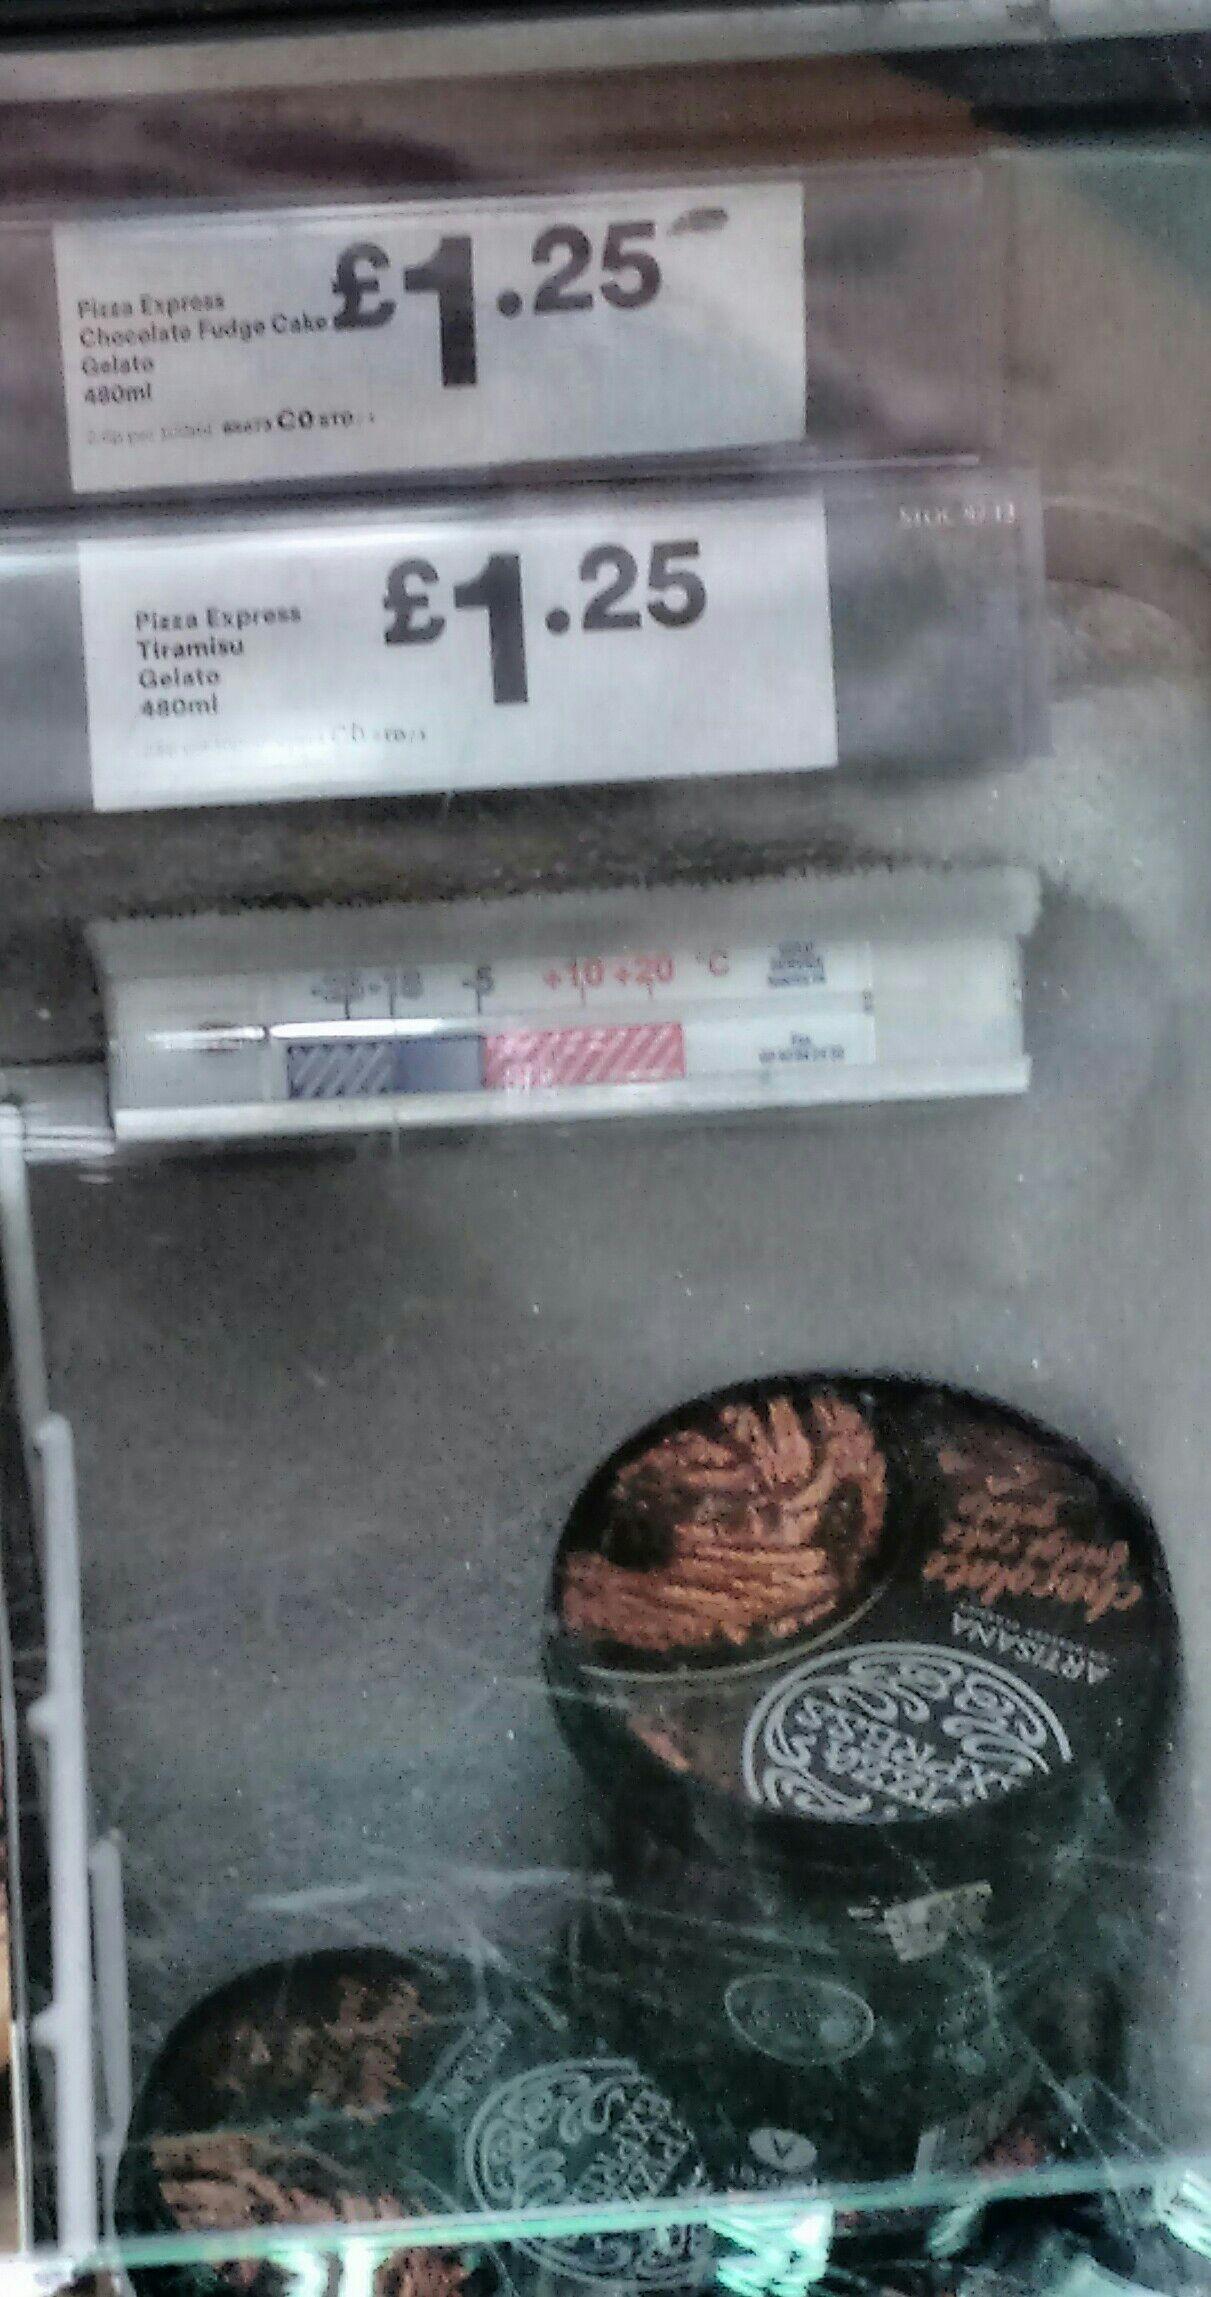 Iceland: Pizza Express gelato 480 ml half price £1.25